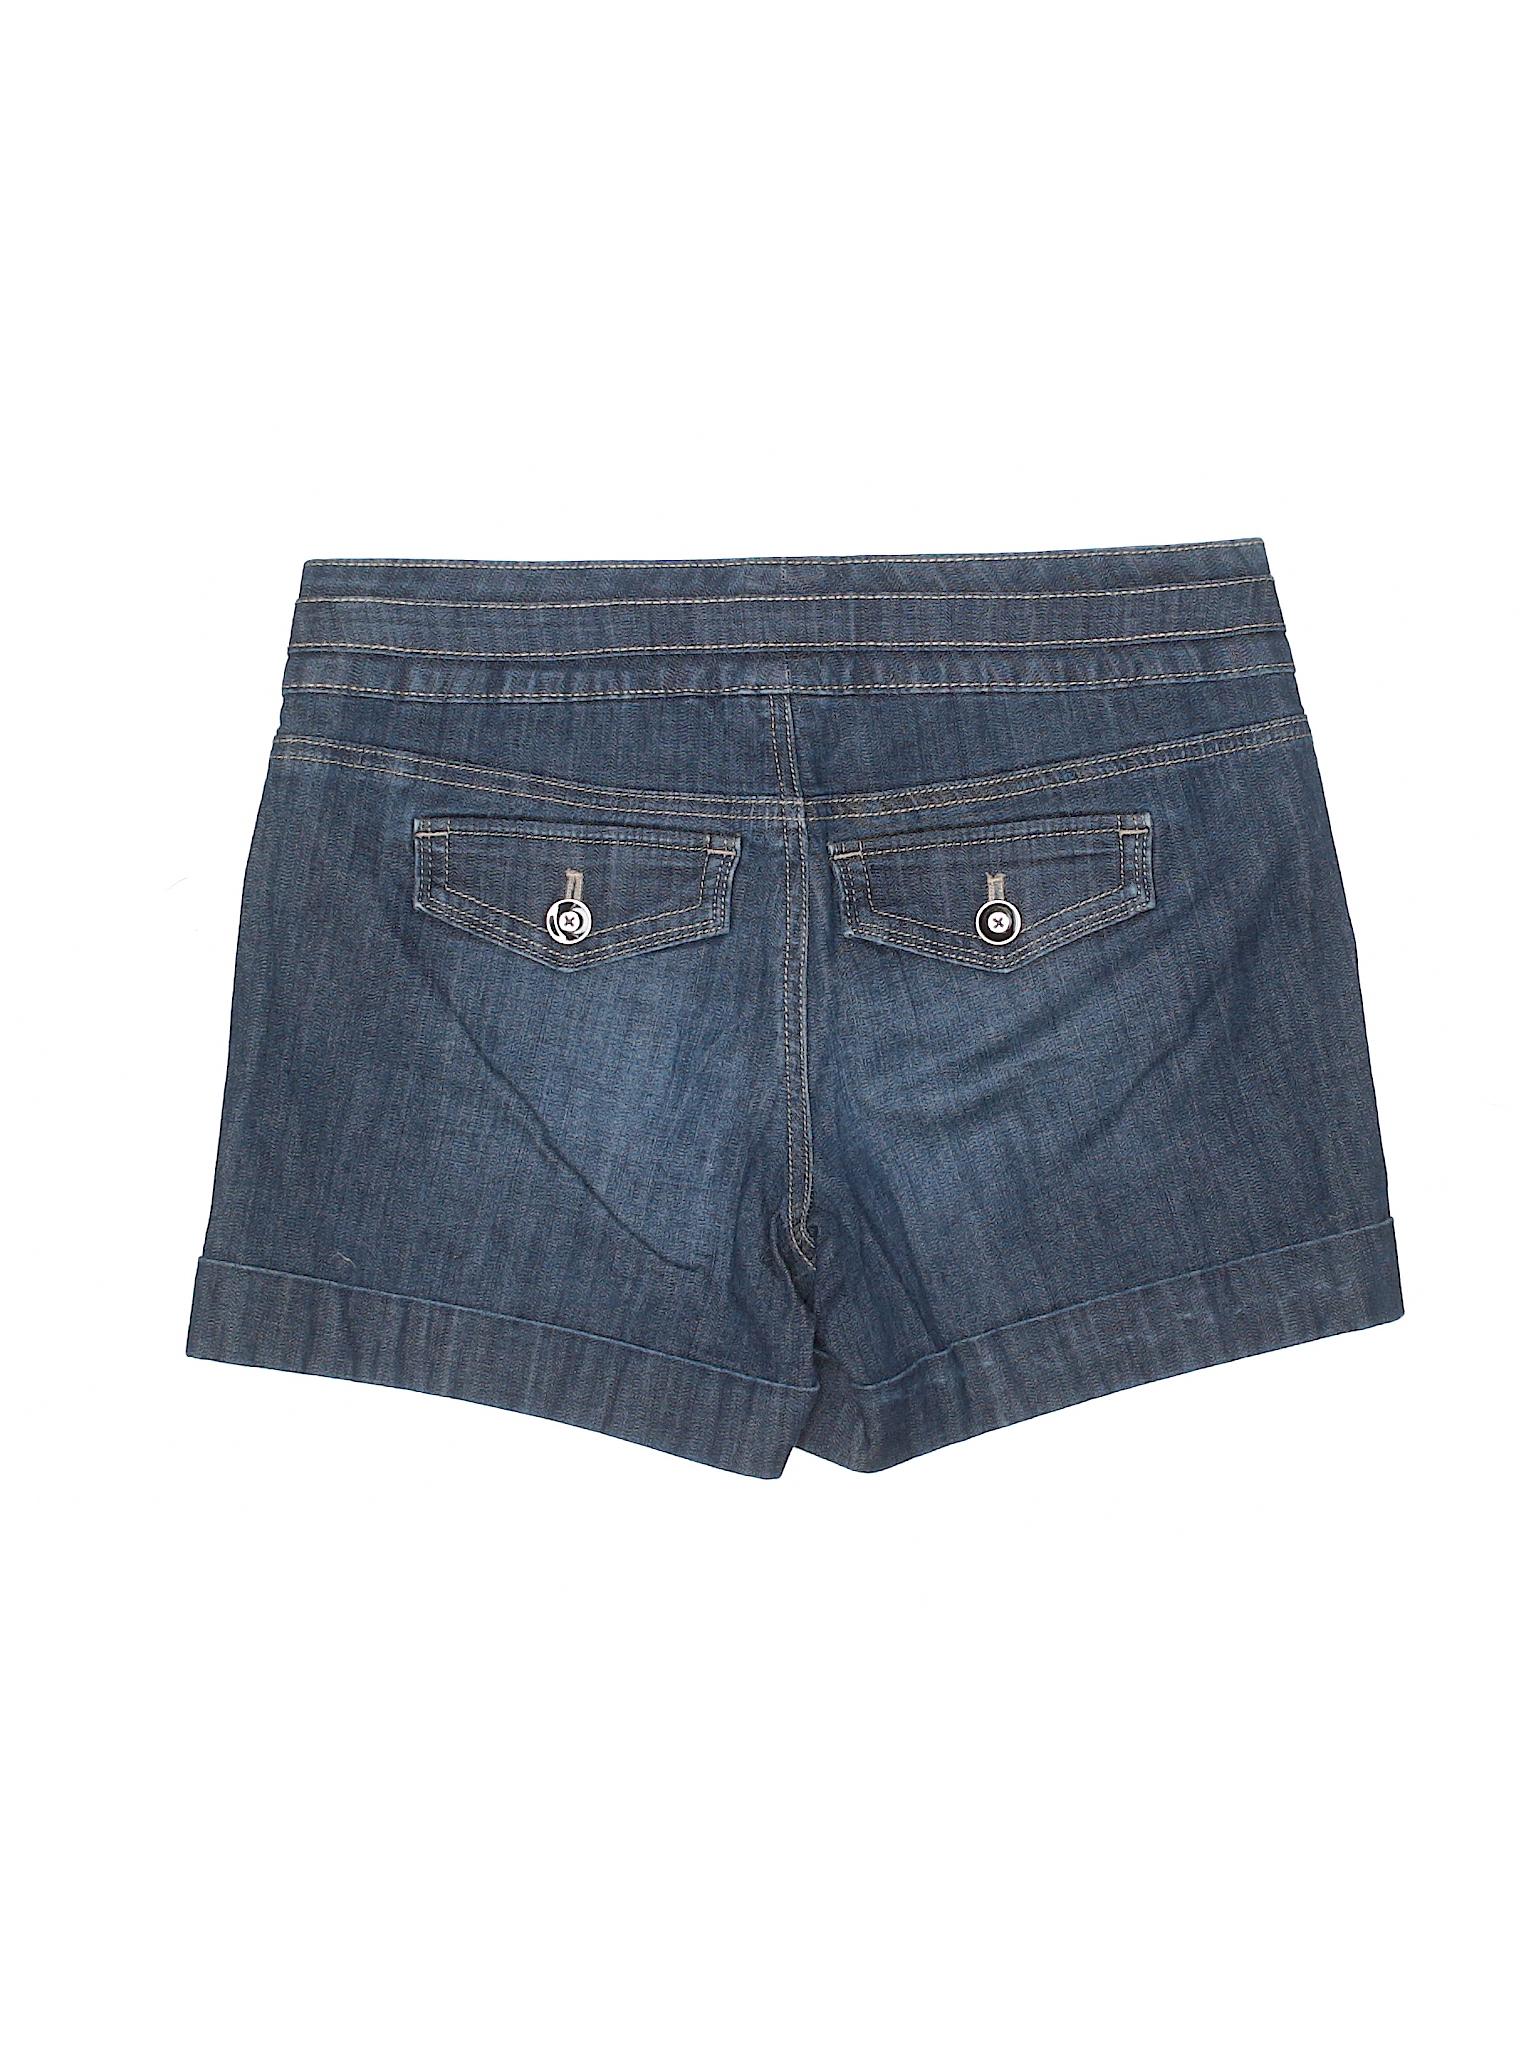 Denim Black Market White House Boutique Shorts qSwEIt